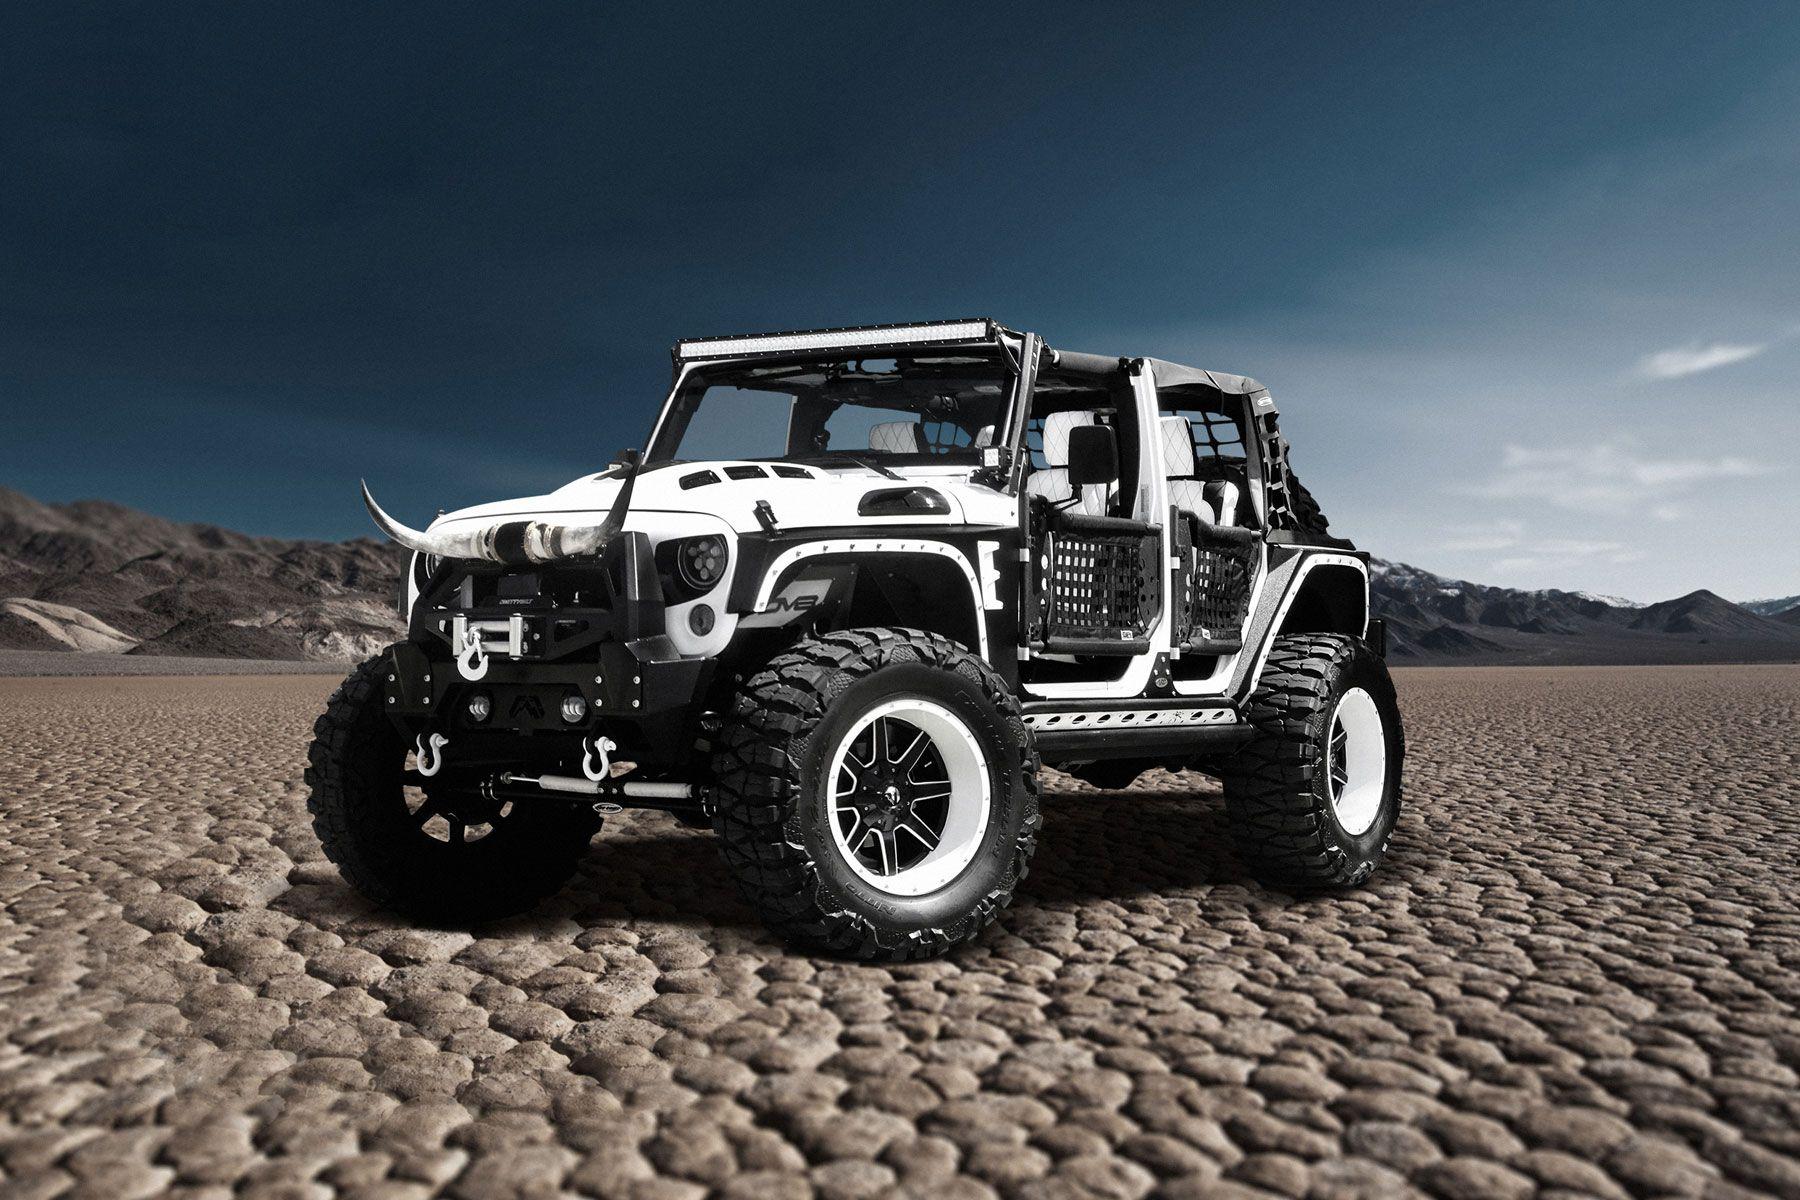 Pin By Loki Cocepeli On Badass Jeep Custom Jeep Jeep Interiors